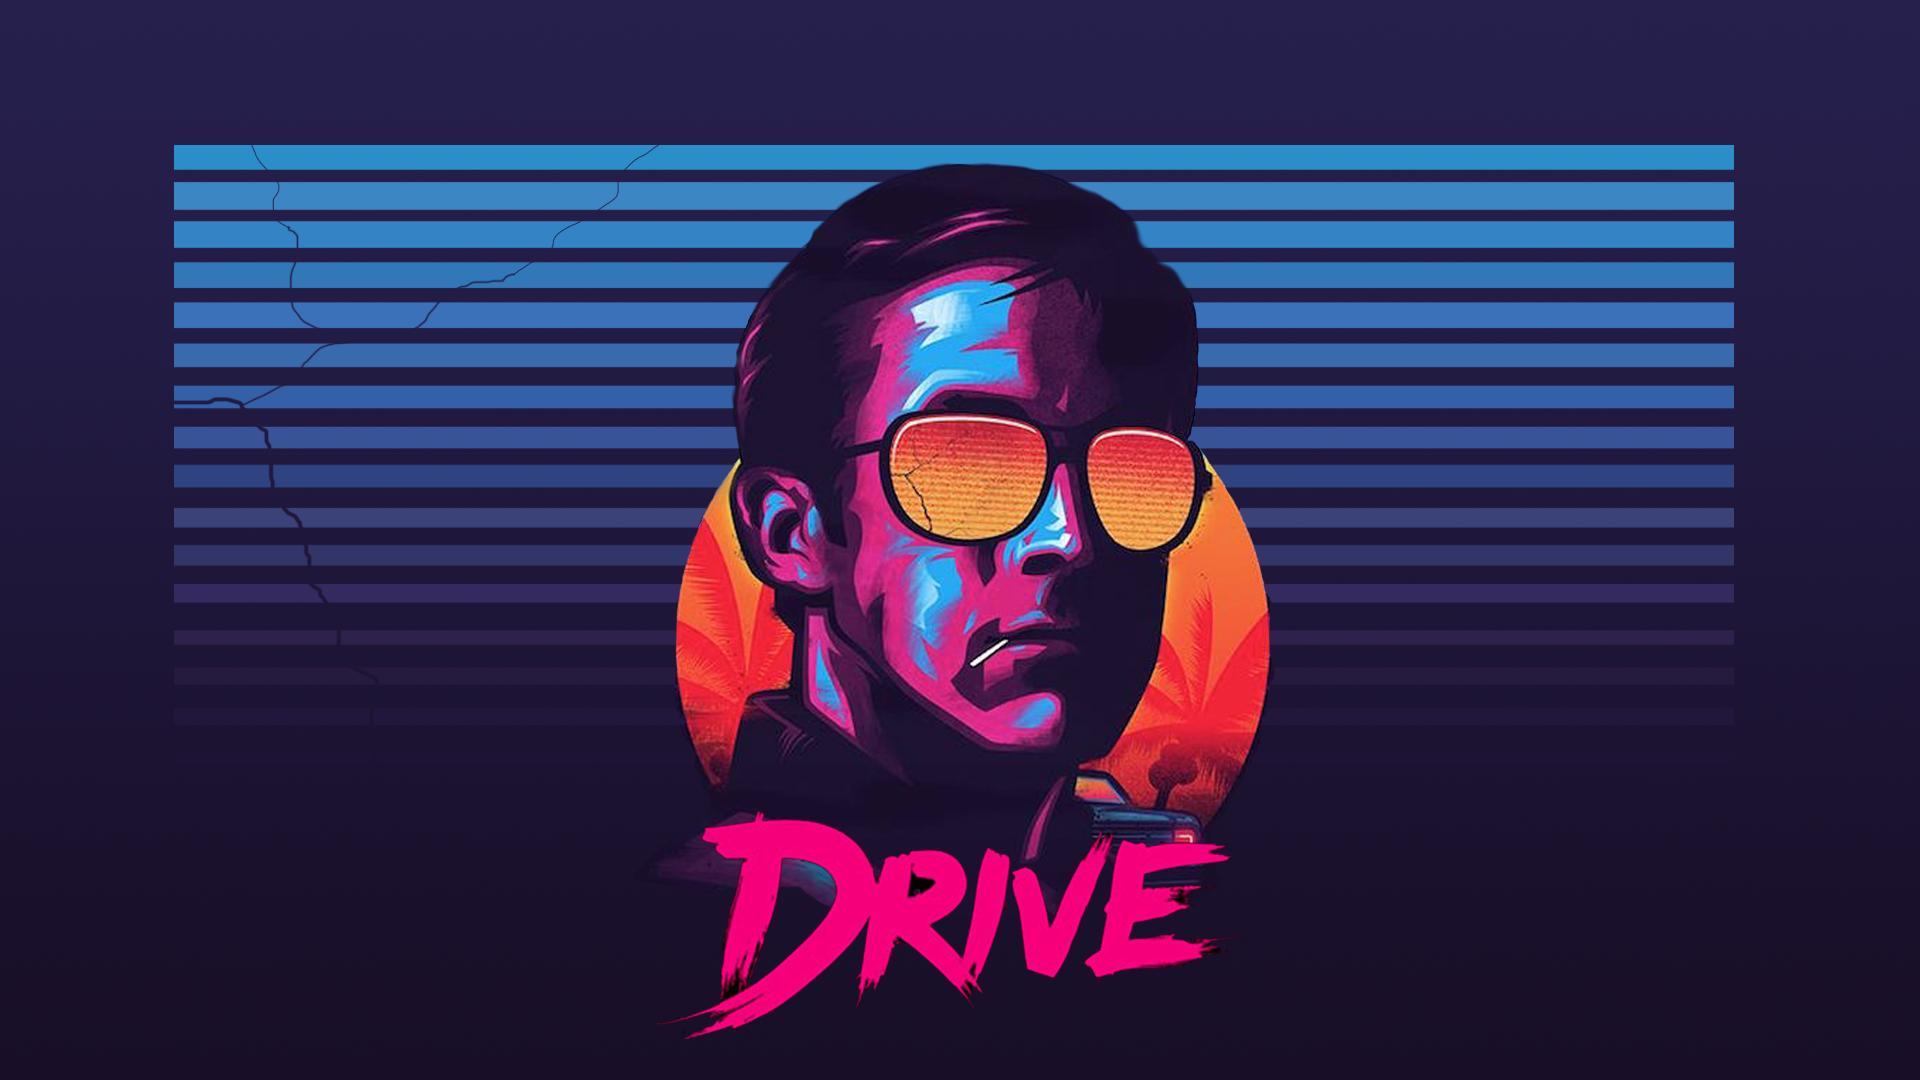 Drive Wallpaper - Wall... Ryan Gosling Movies